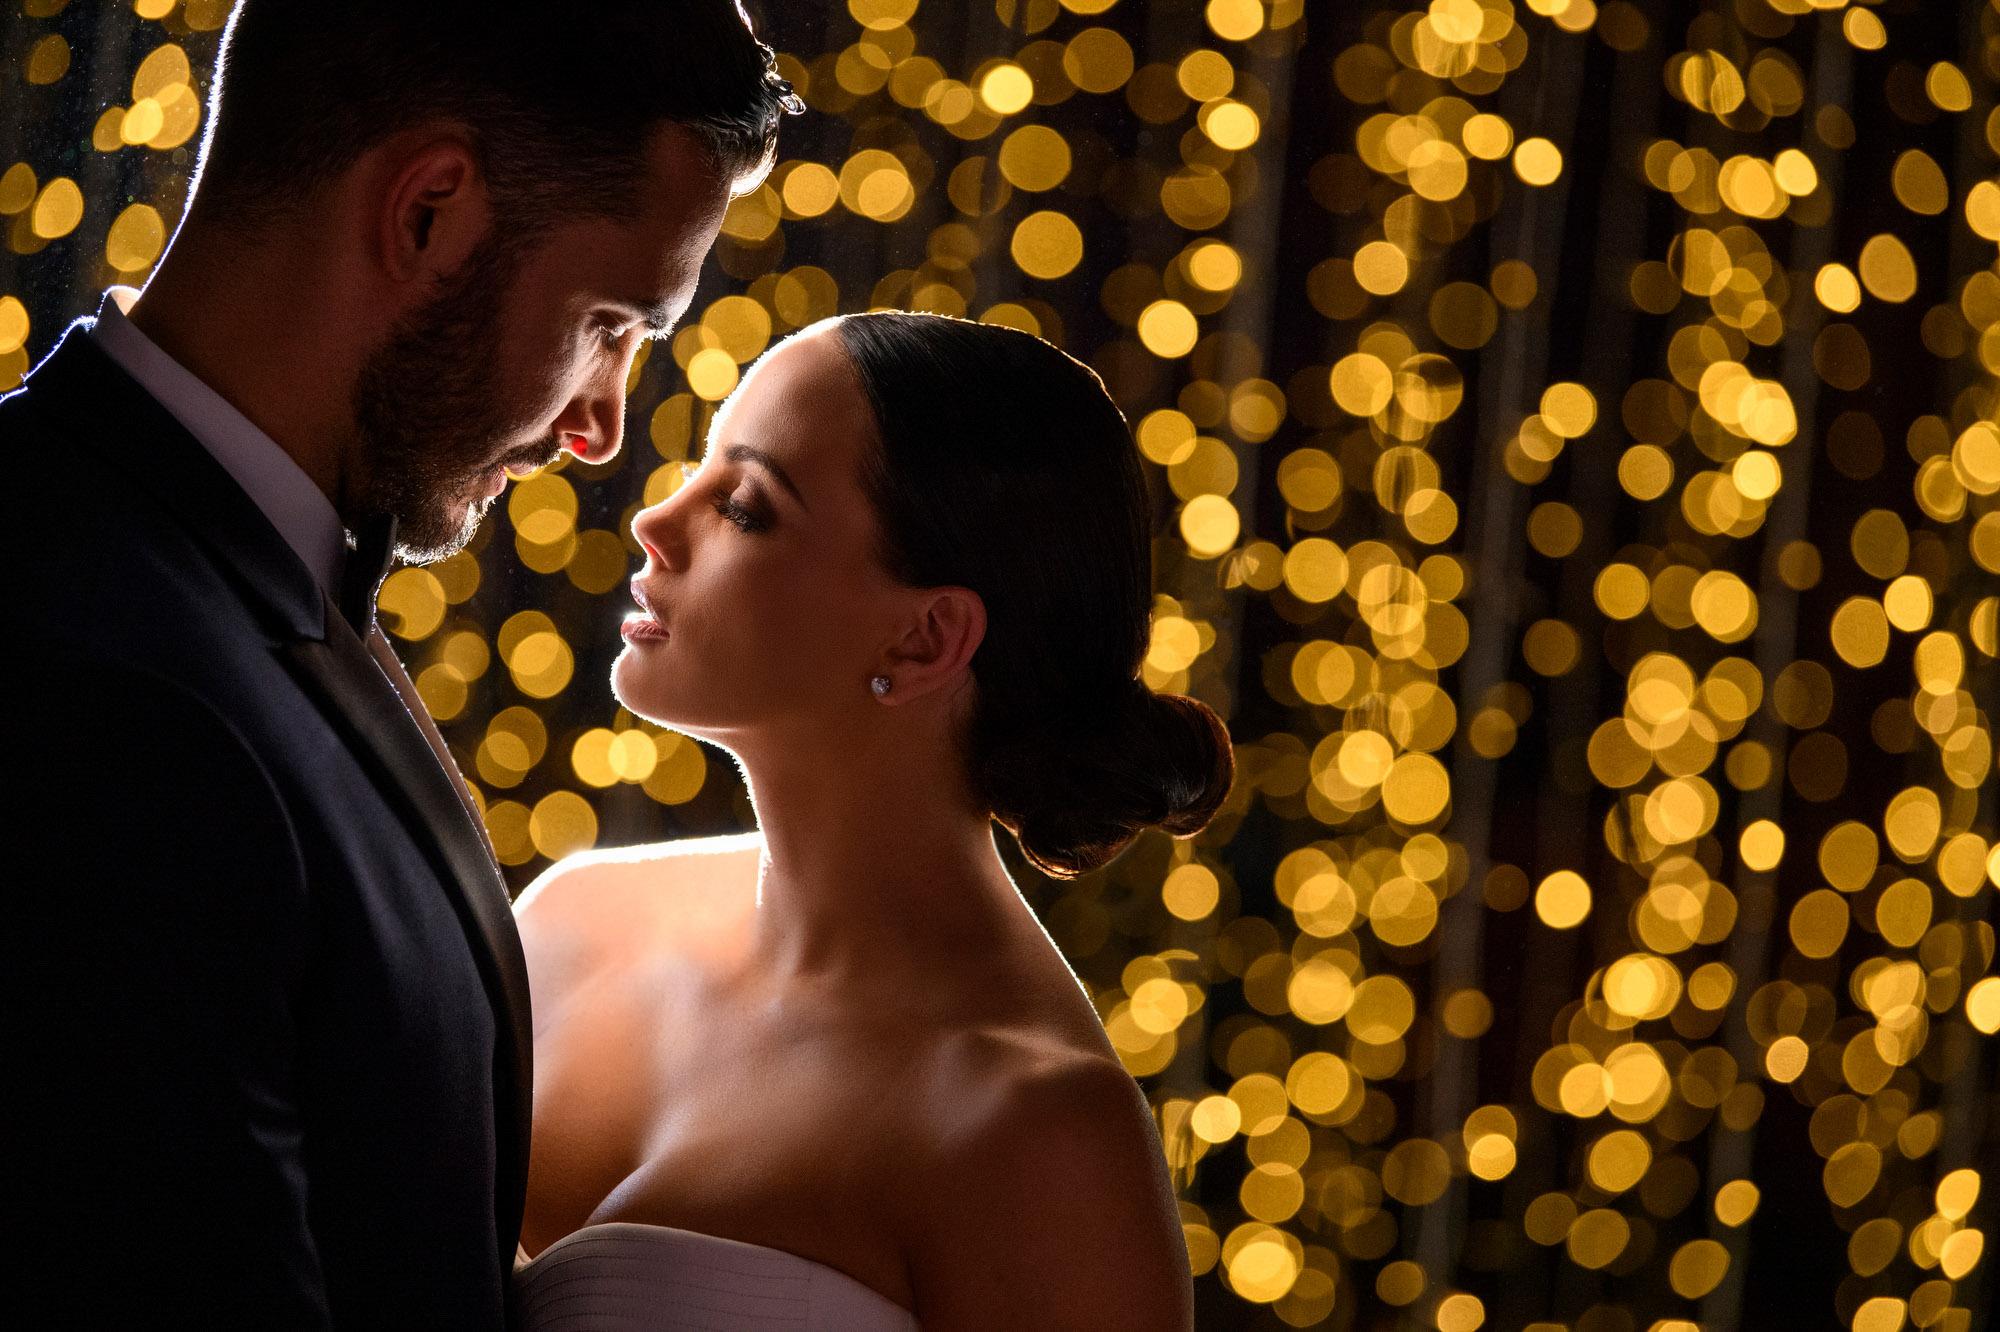 bokeh-portrait-brunette-bride-with-groom-best-wedding-photos-jerry-ghionis-top-las-vegas-photographer